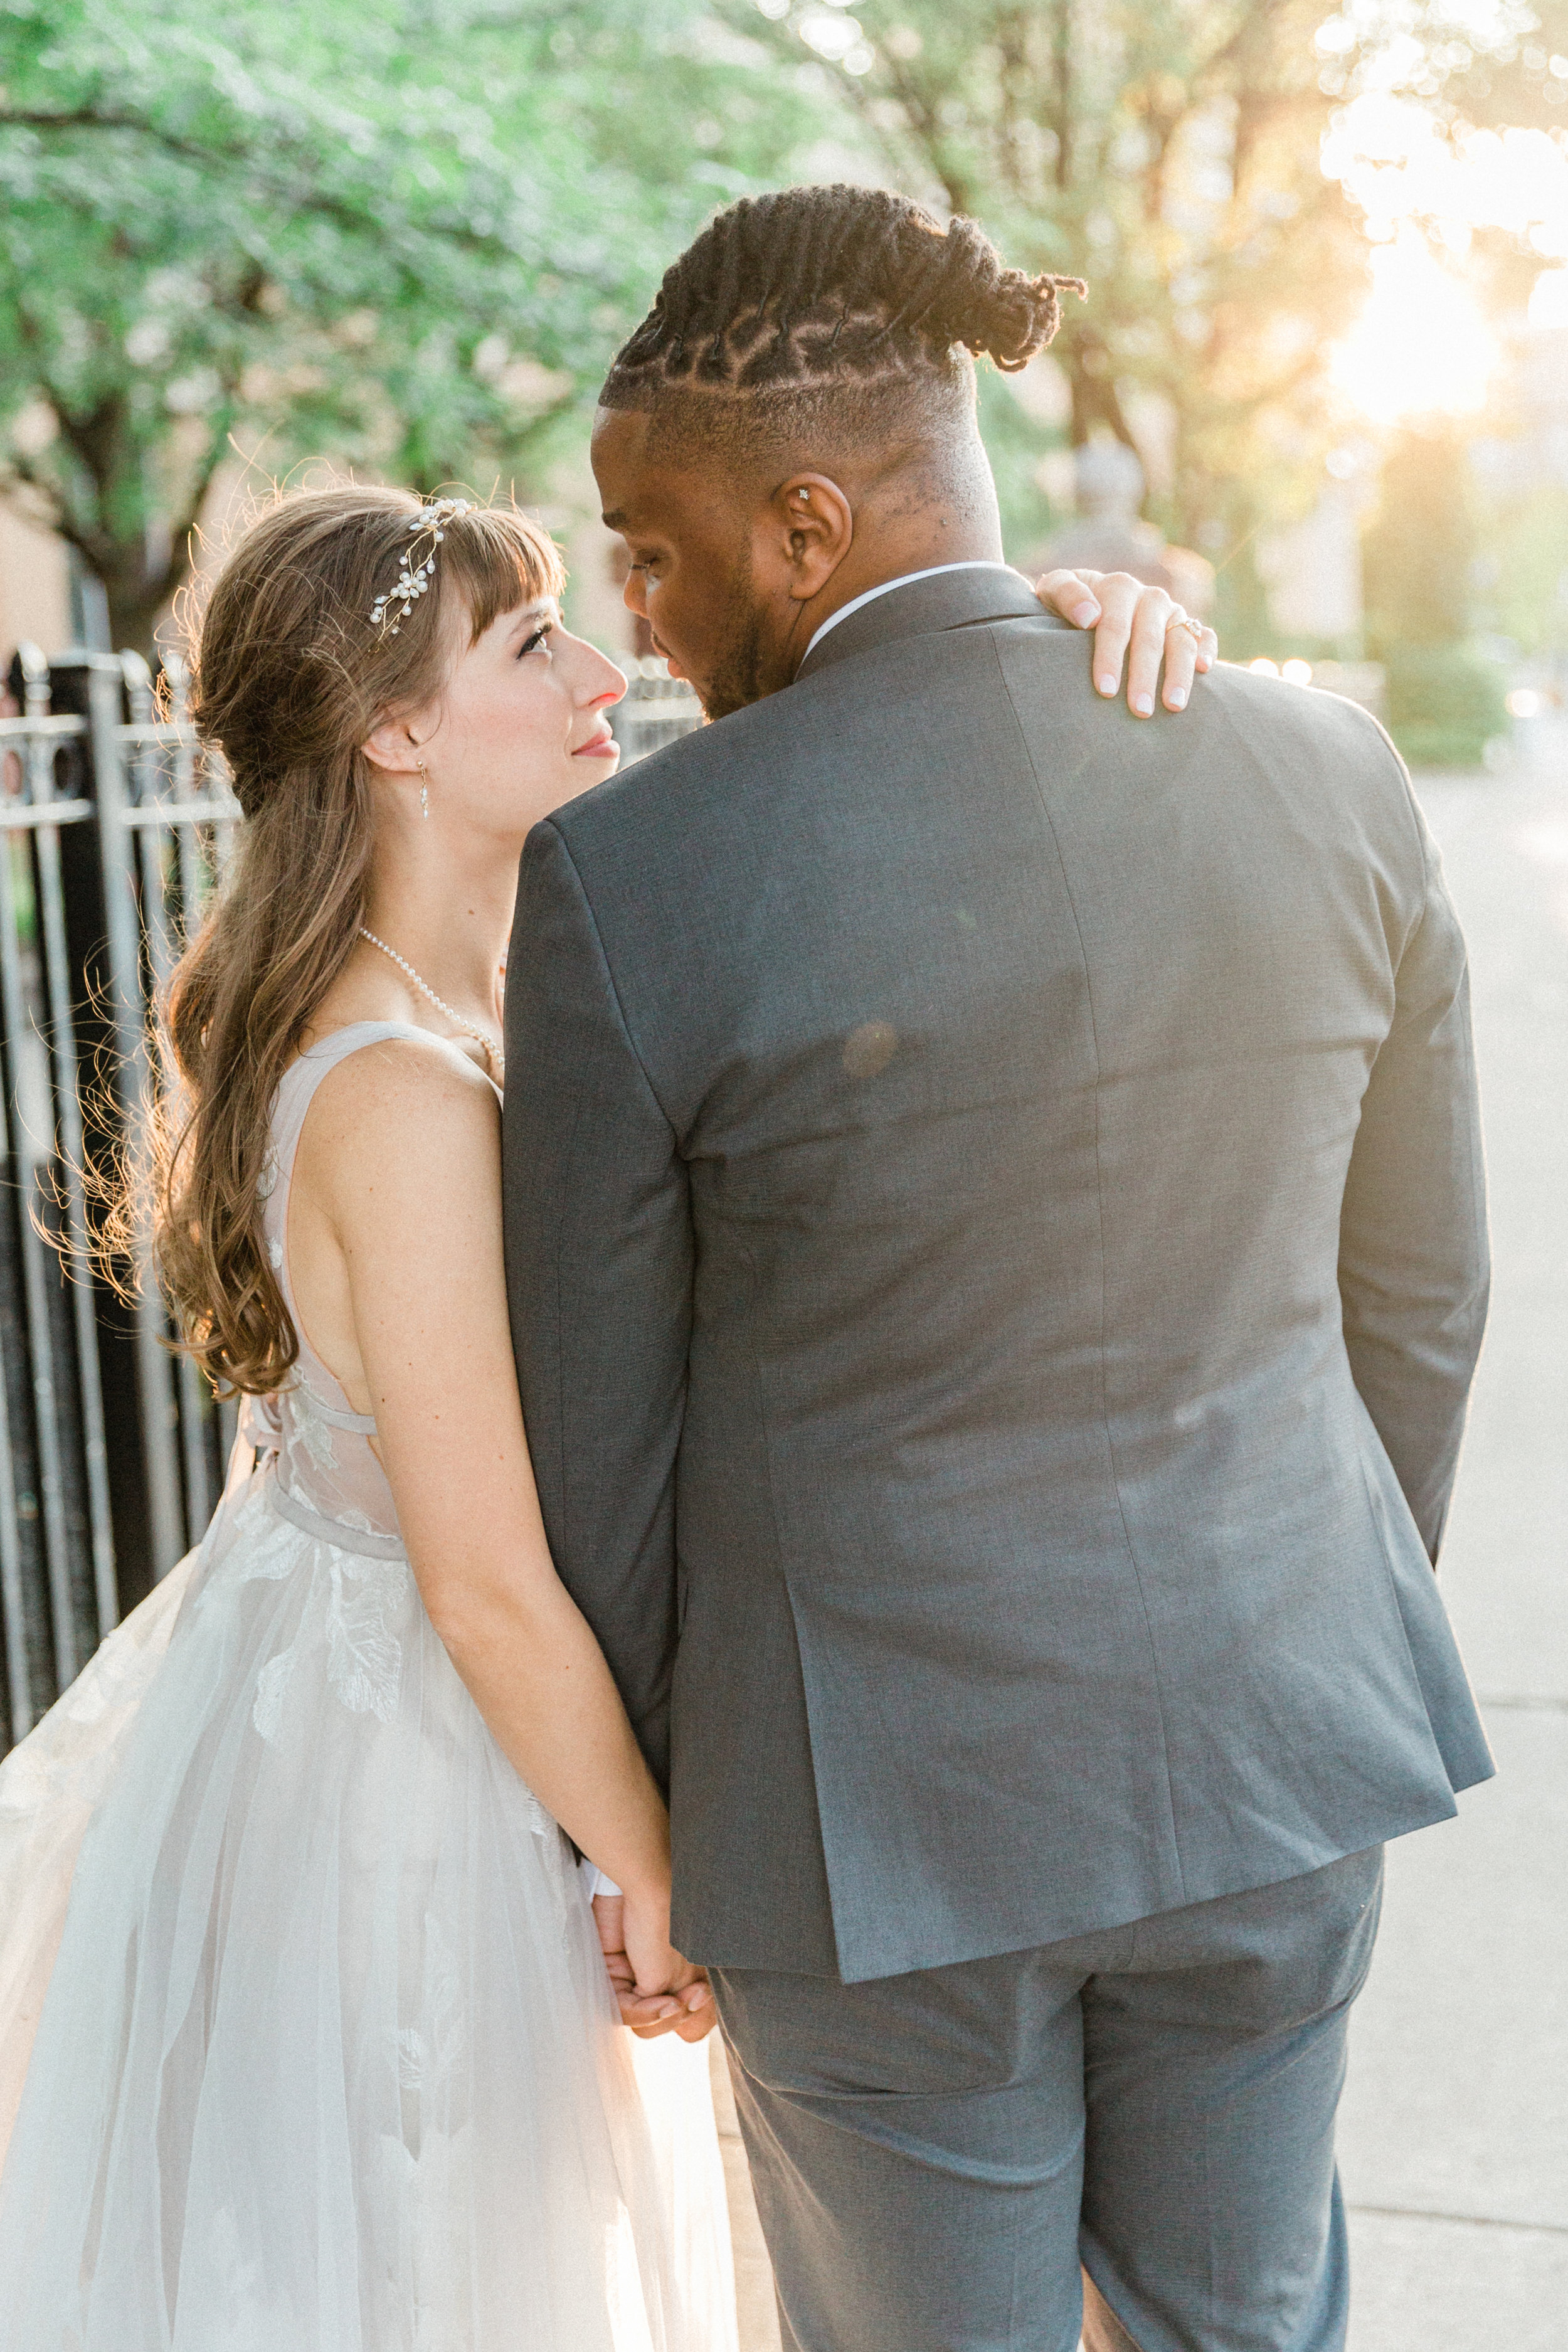 Mallory and Aaron - Married - Sneaks - Lauren Alisse Photography-76.jpg